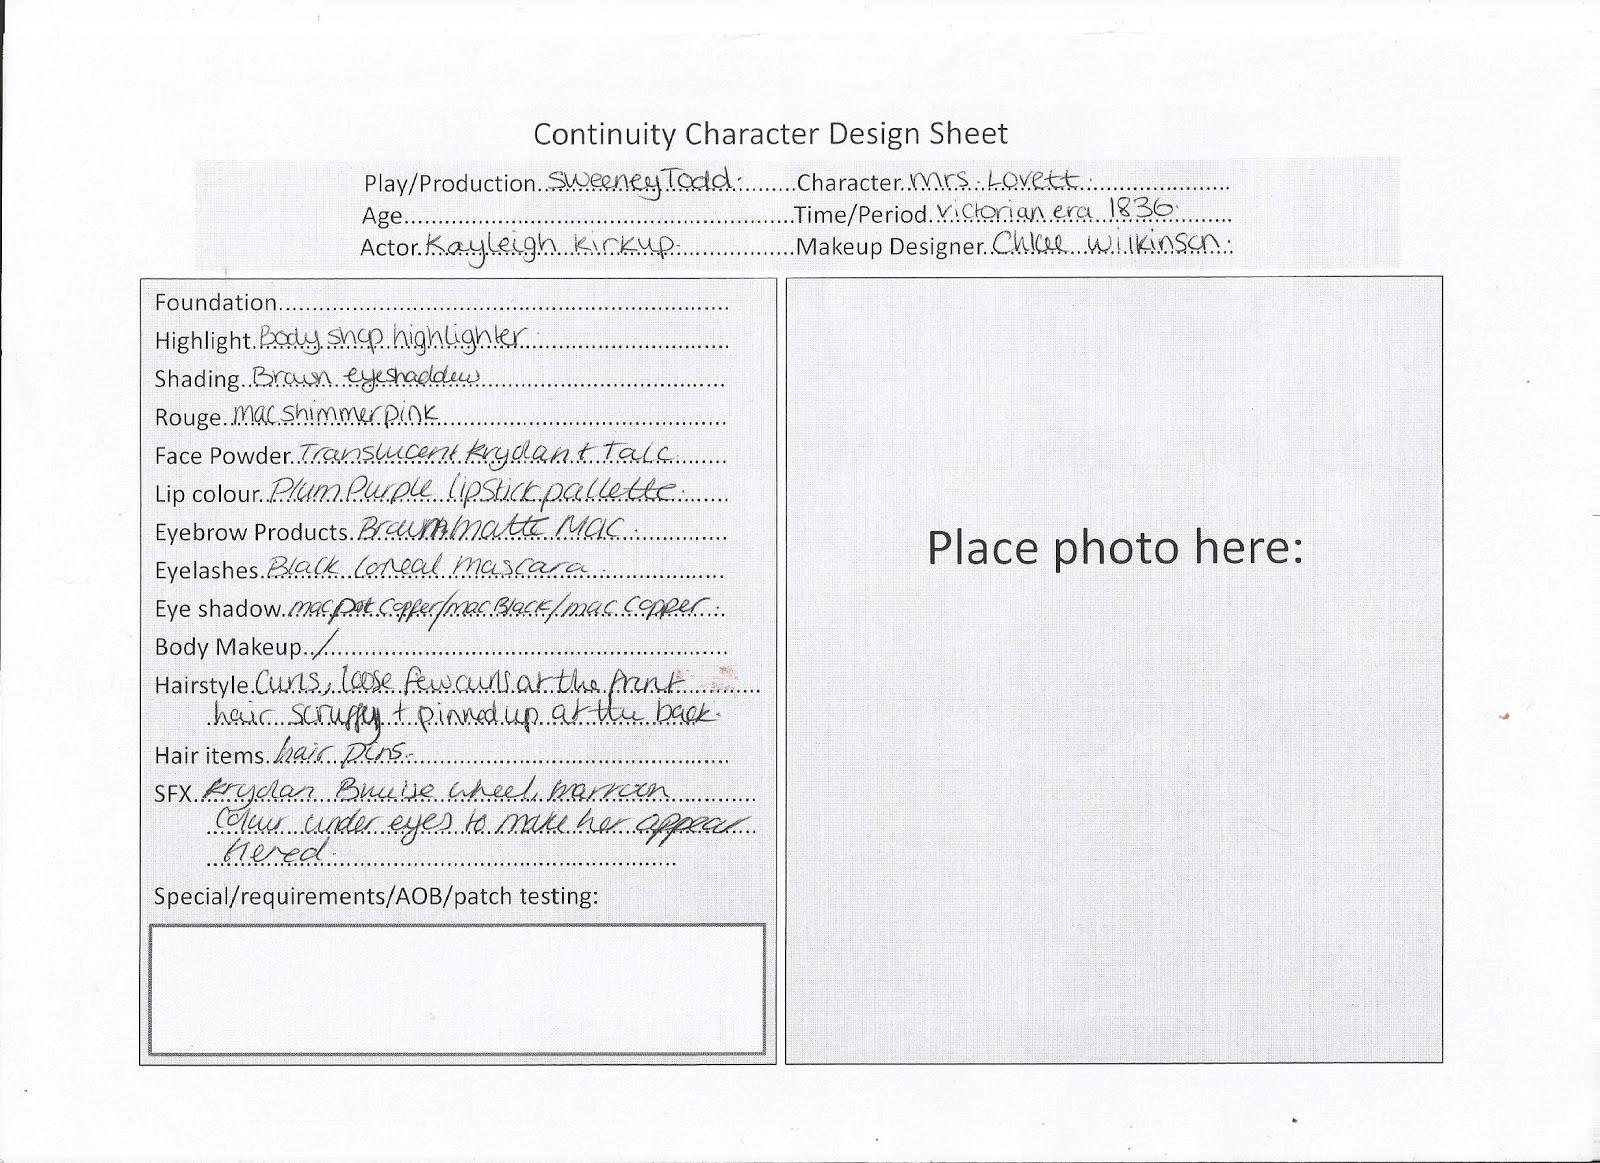 Chloe Wilkinson Make Up Artist Charatcer Design Sheet